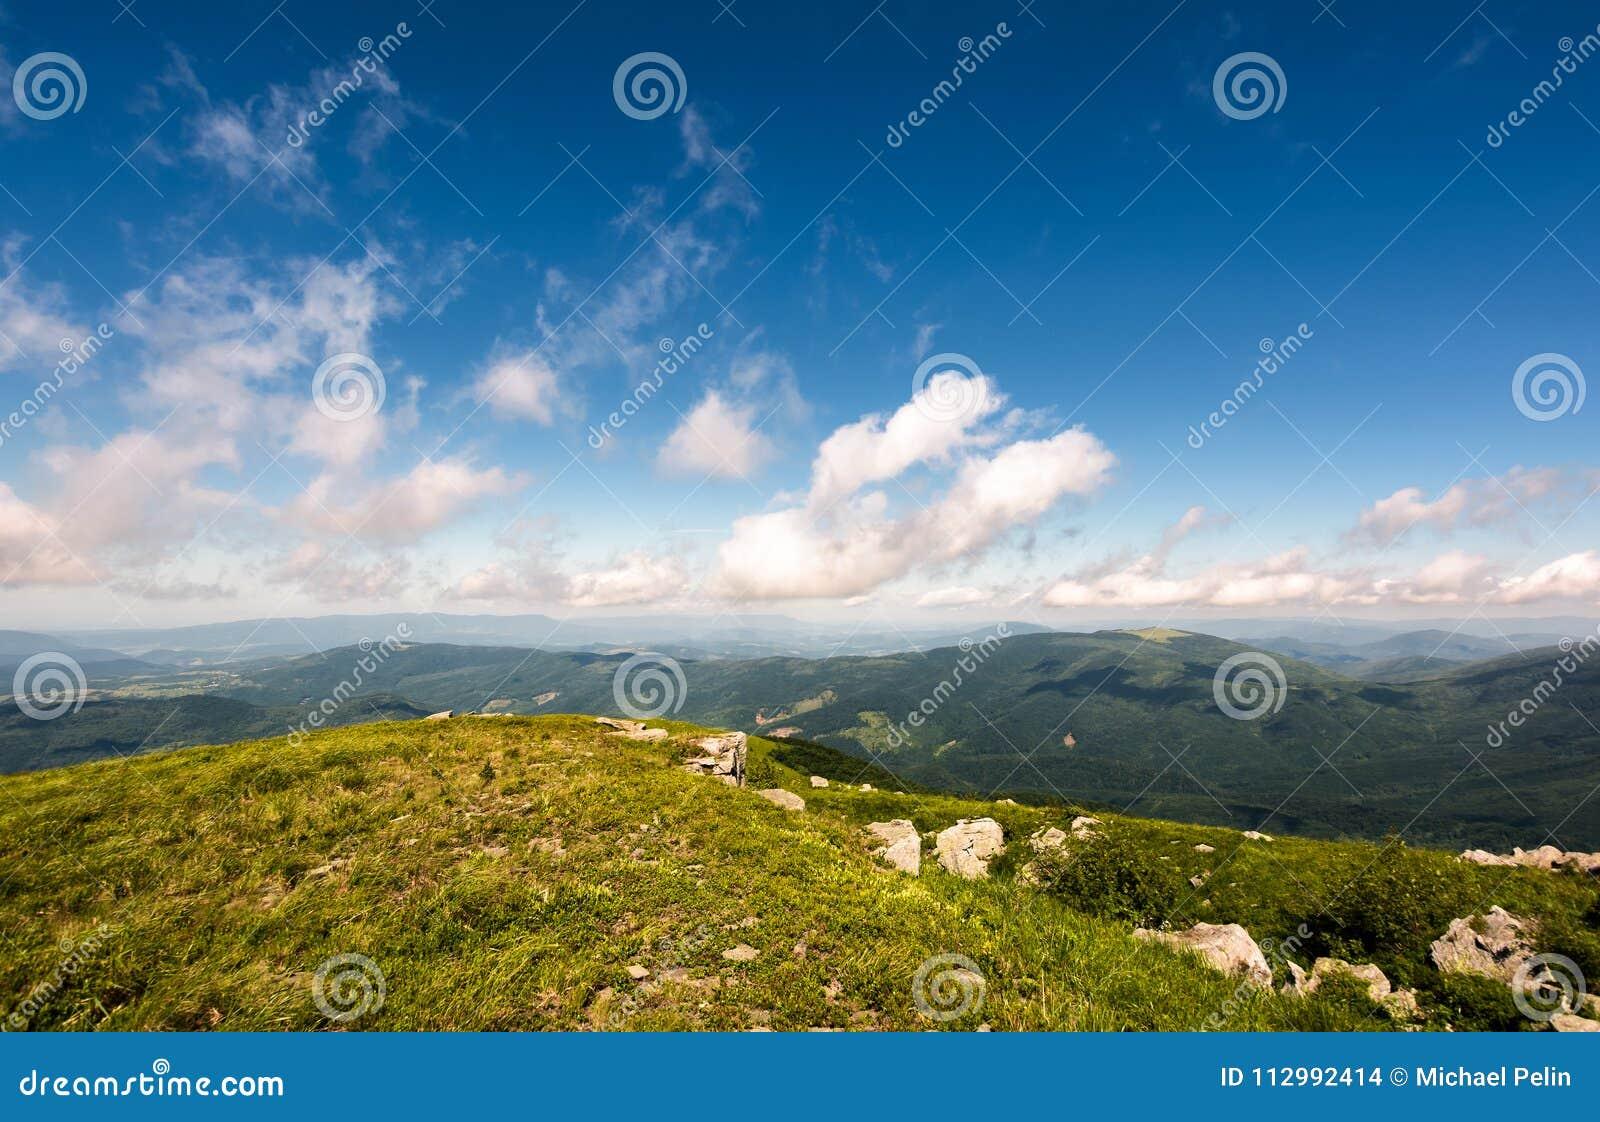 Beautiful mountainous landscape in summer